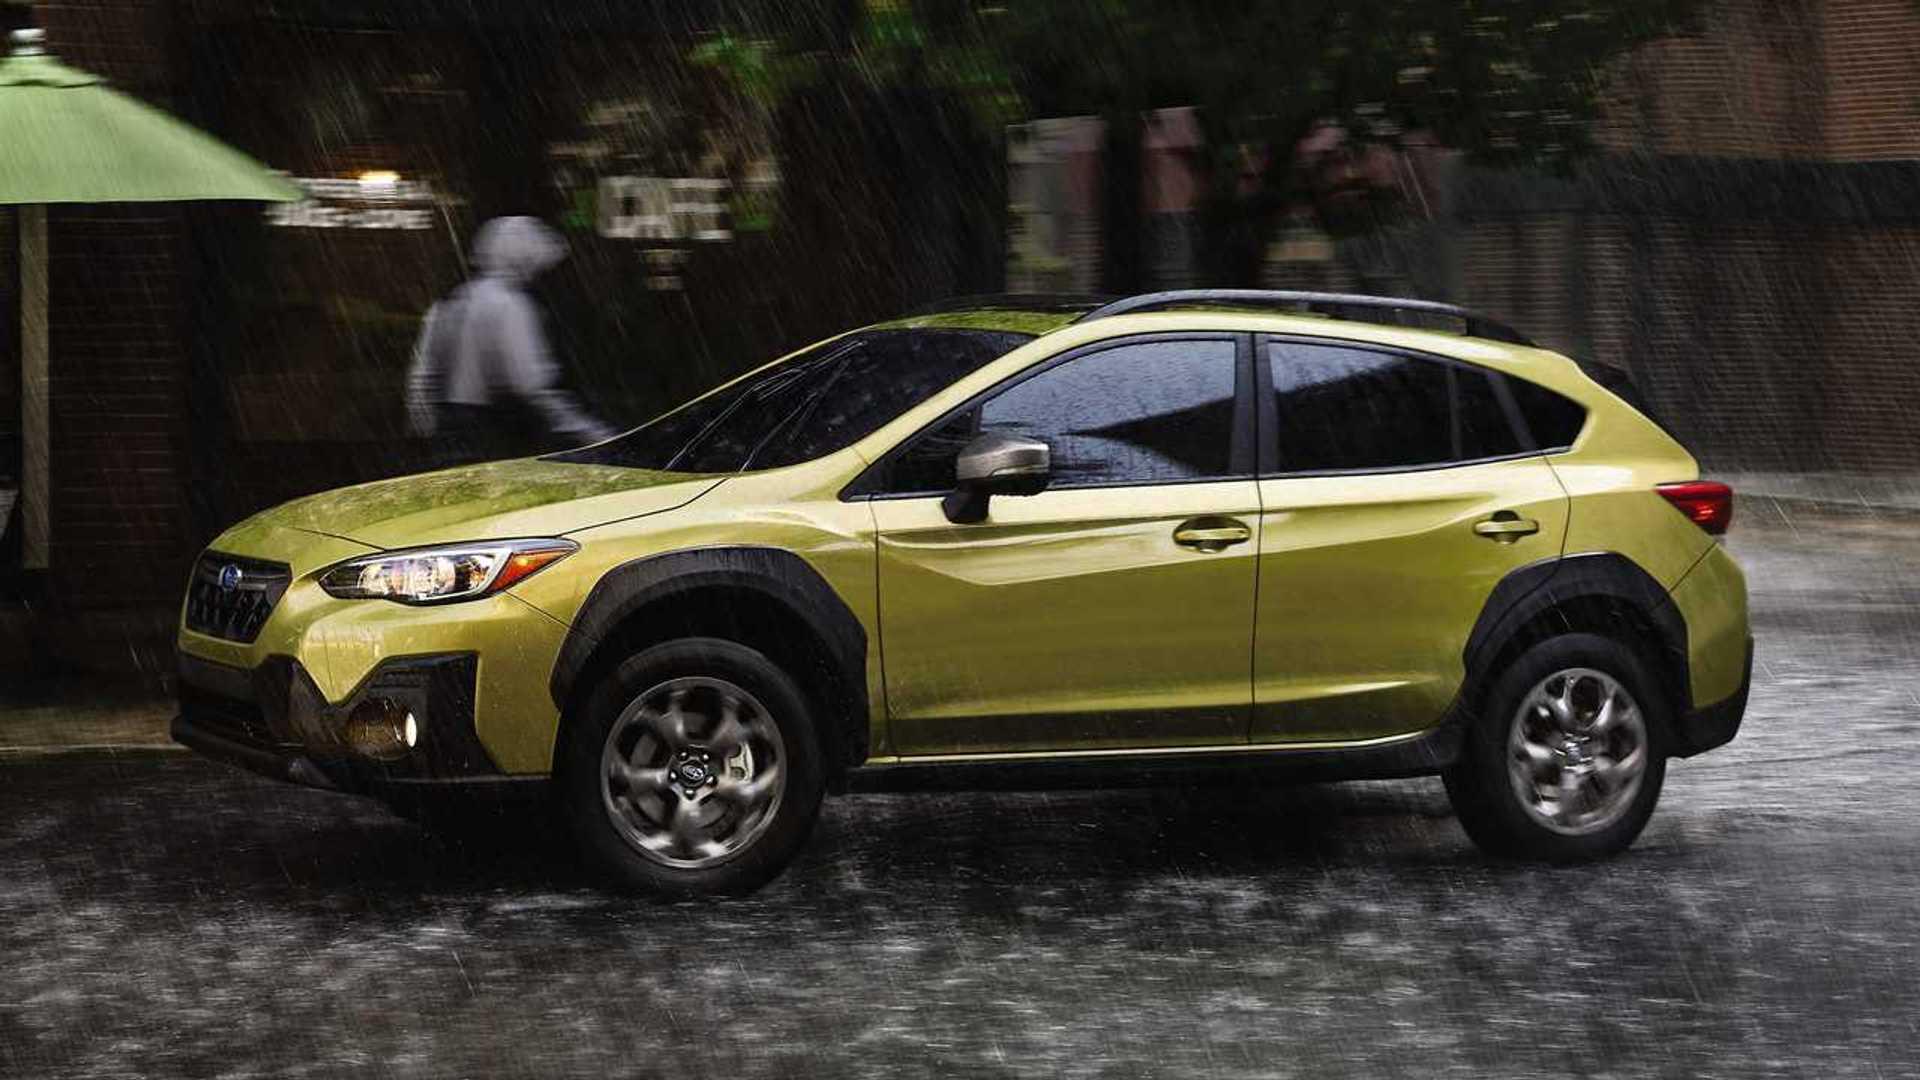 2021 Subaru Crosstrek Debuts With Sport Model, More Powerful Engine